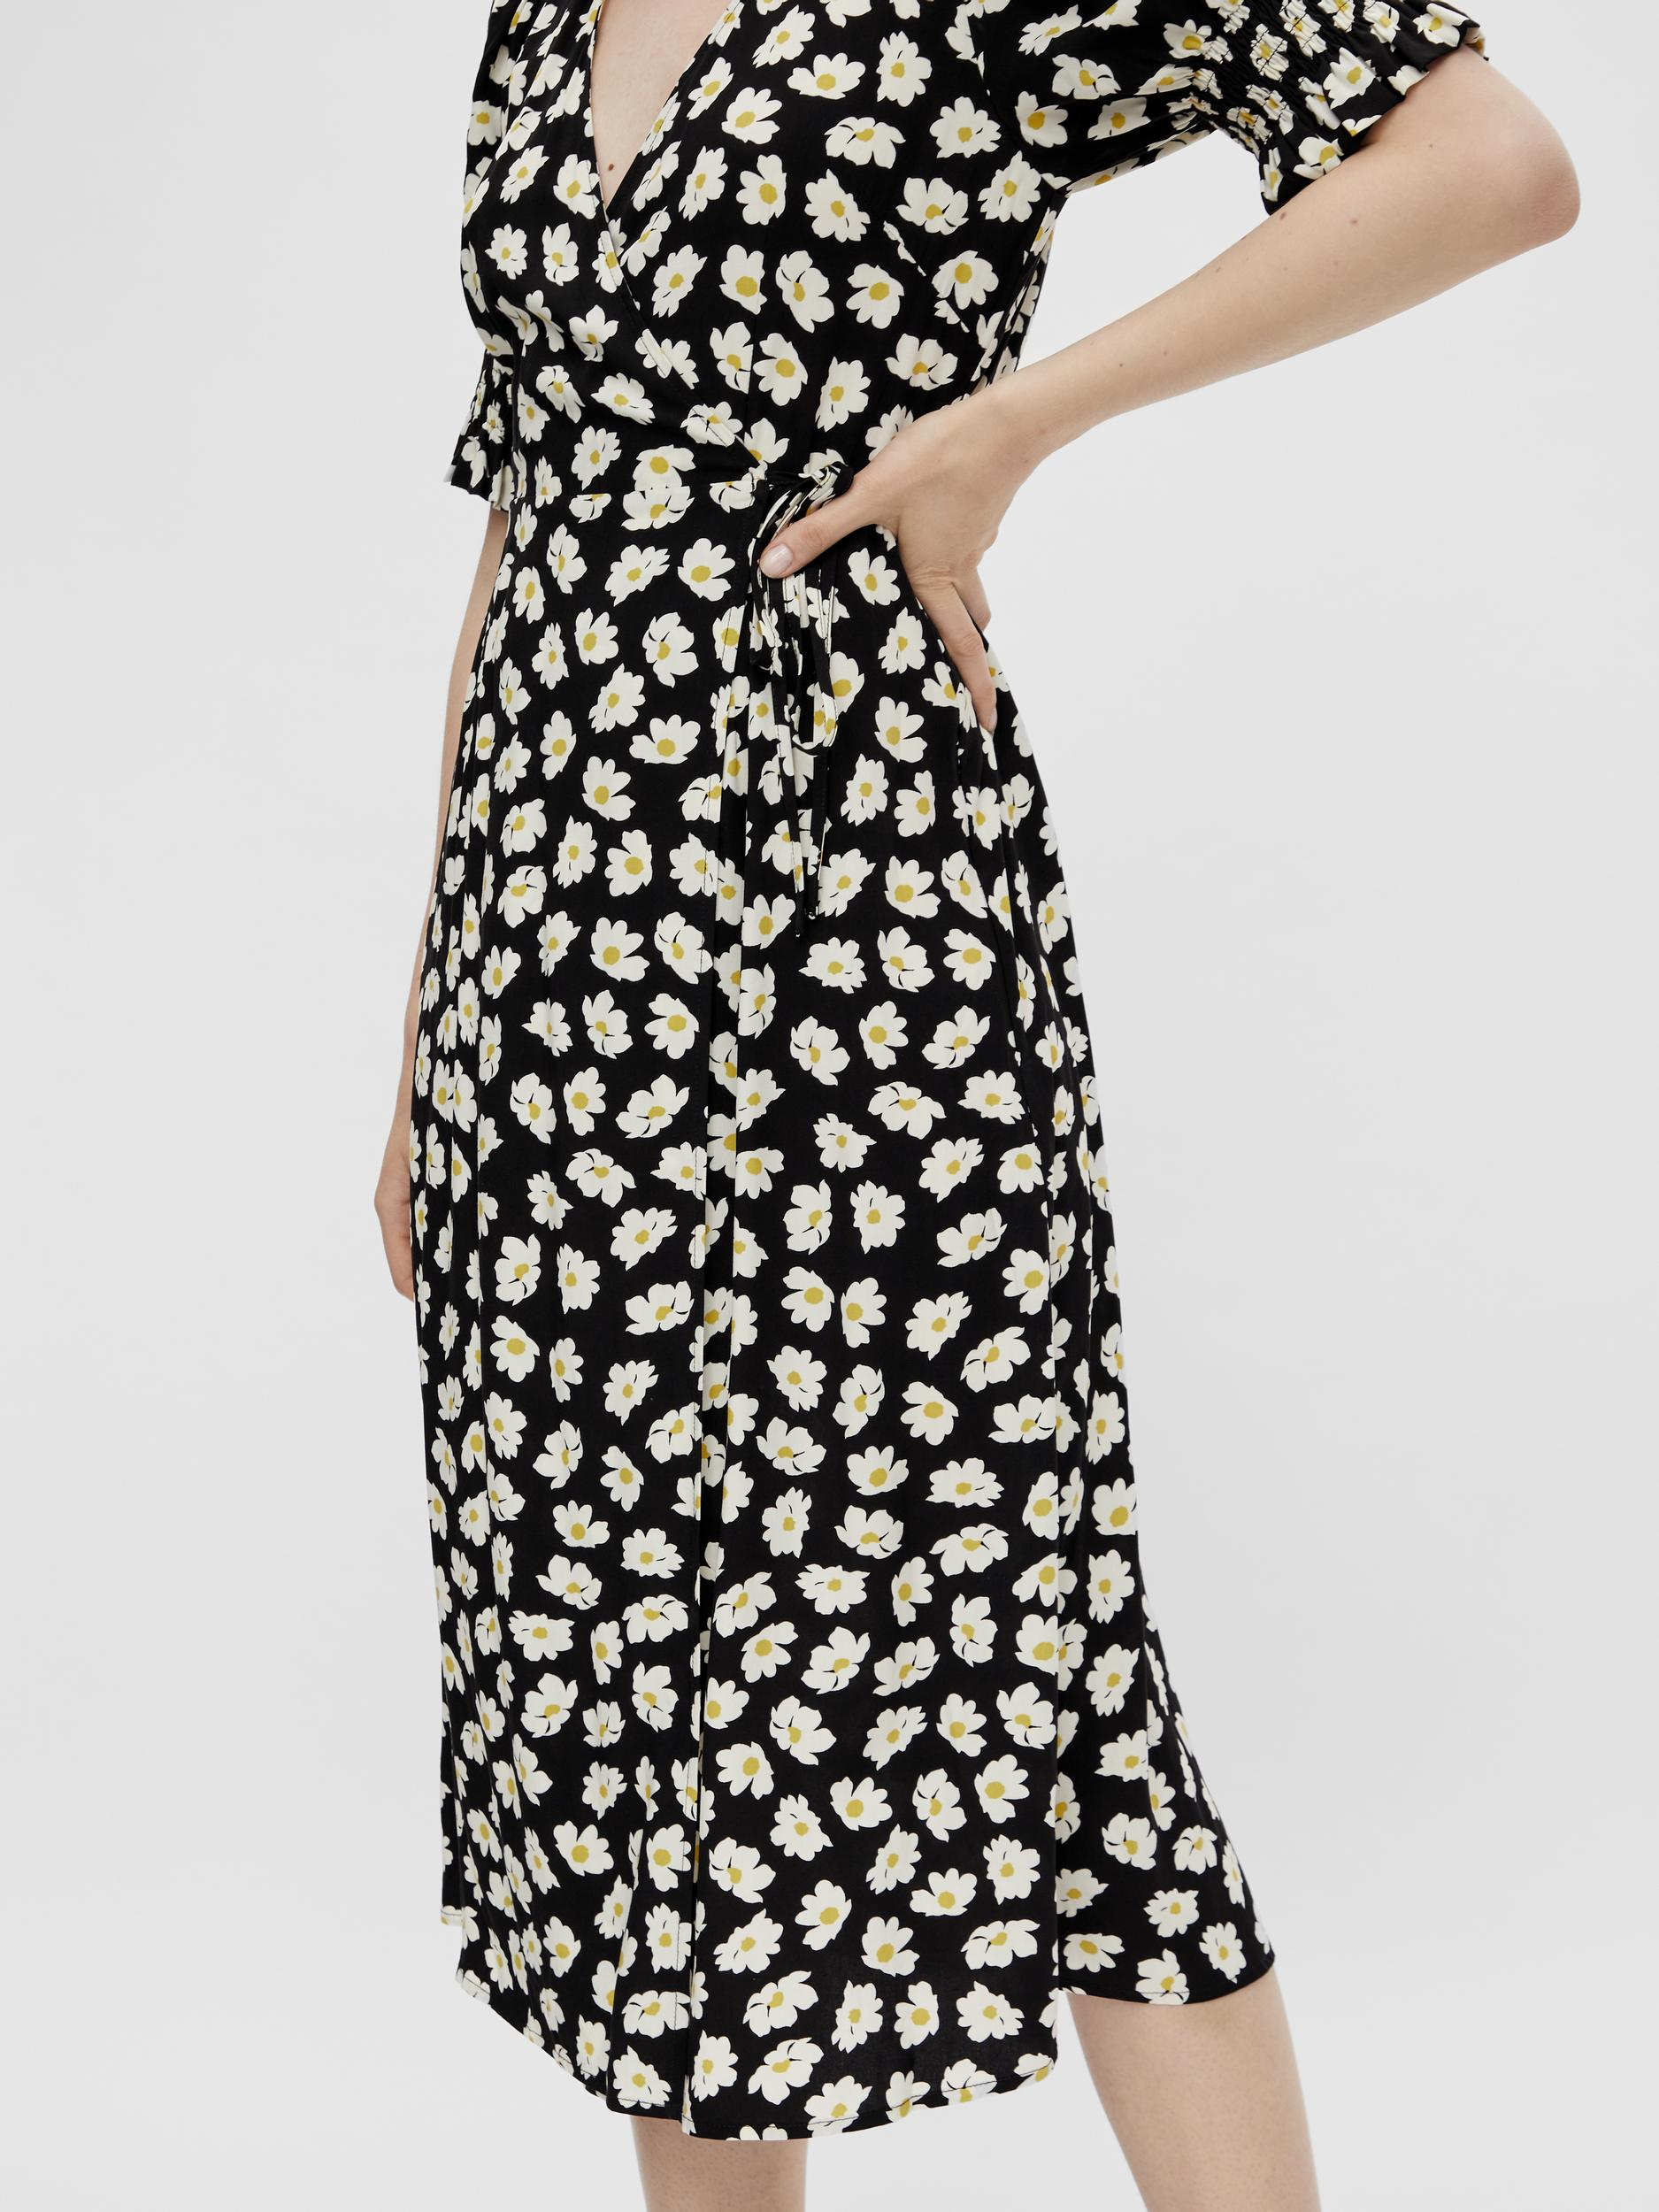 Pieces Rasmine SS kjole, black, large